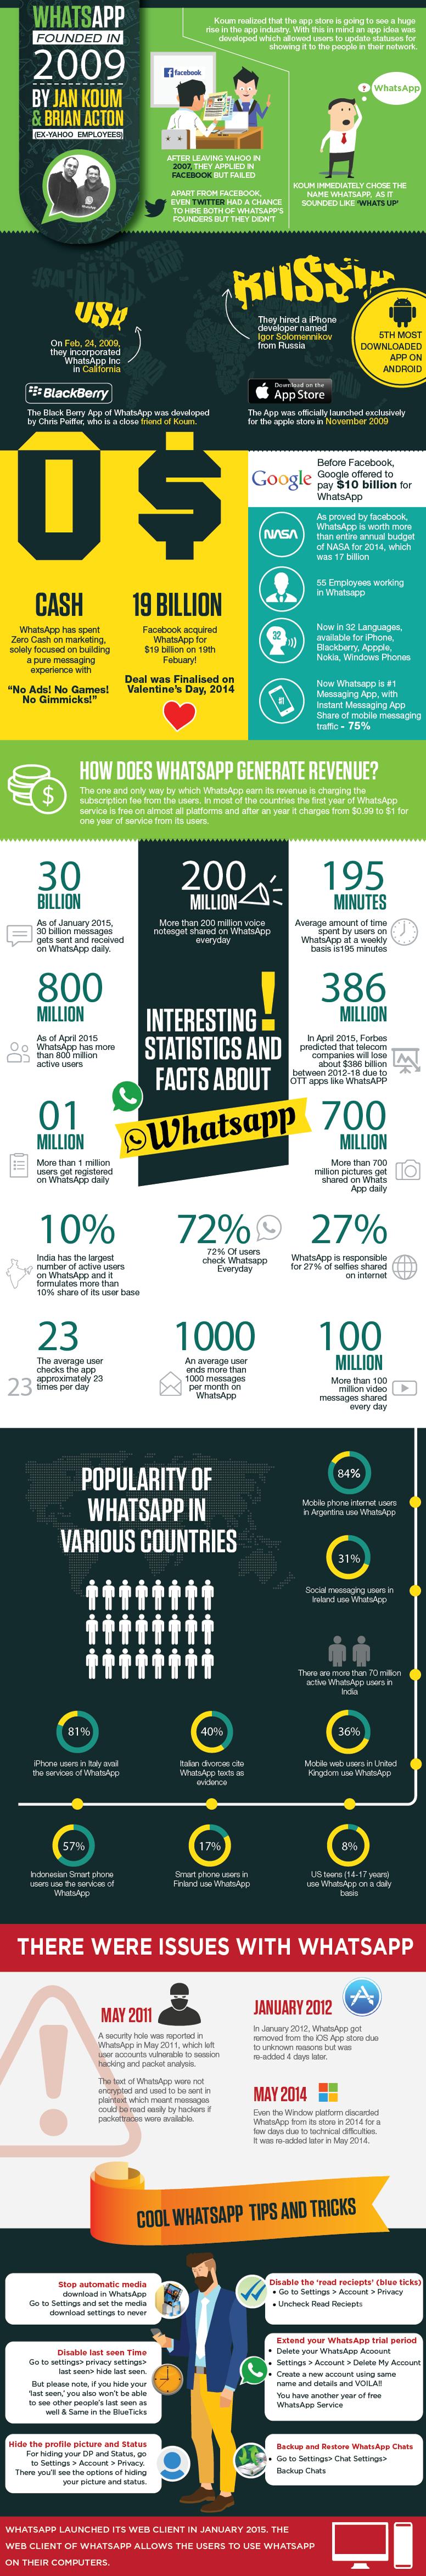 whatsapp statistici 2015